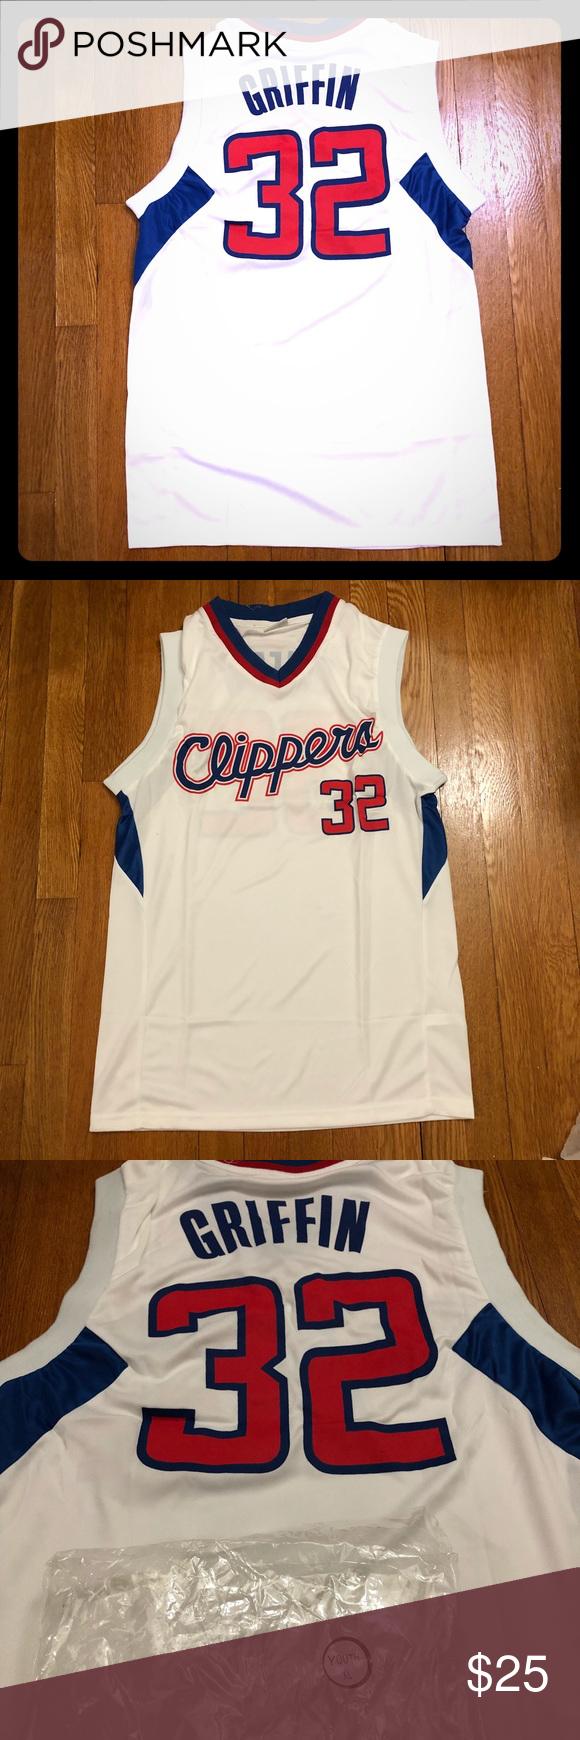 Nwot La Clippers Blake Griffin Jersey Replica Jersey From La Clippers Blake Griffin Item Was Received As A Priz Blake Griffin Jersey Blake Griffin La Clippers